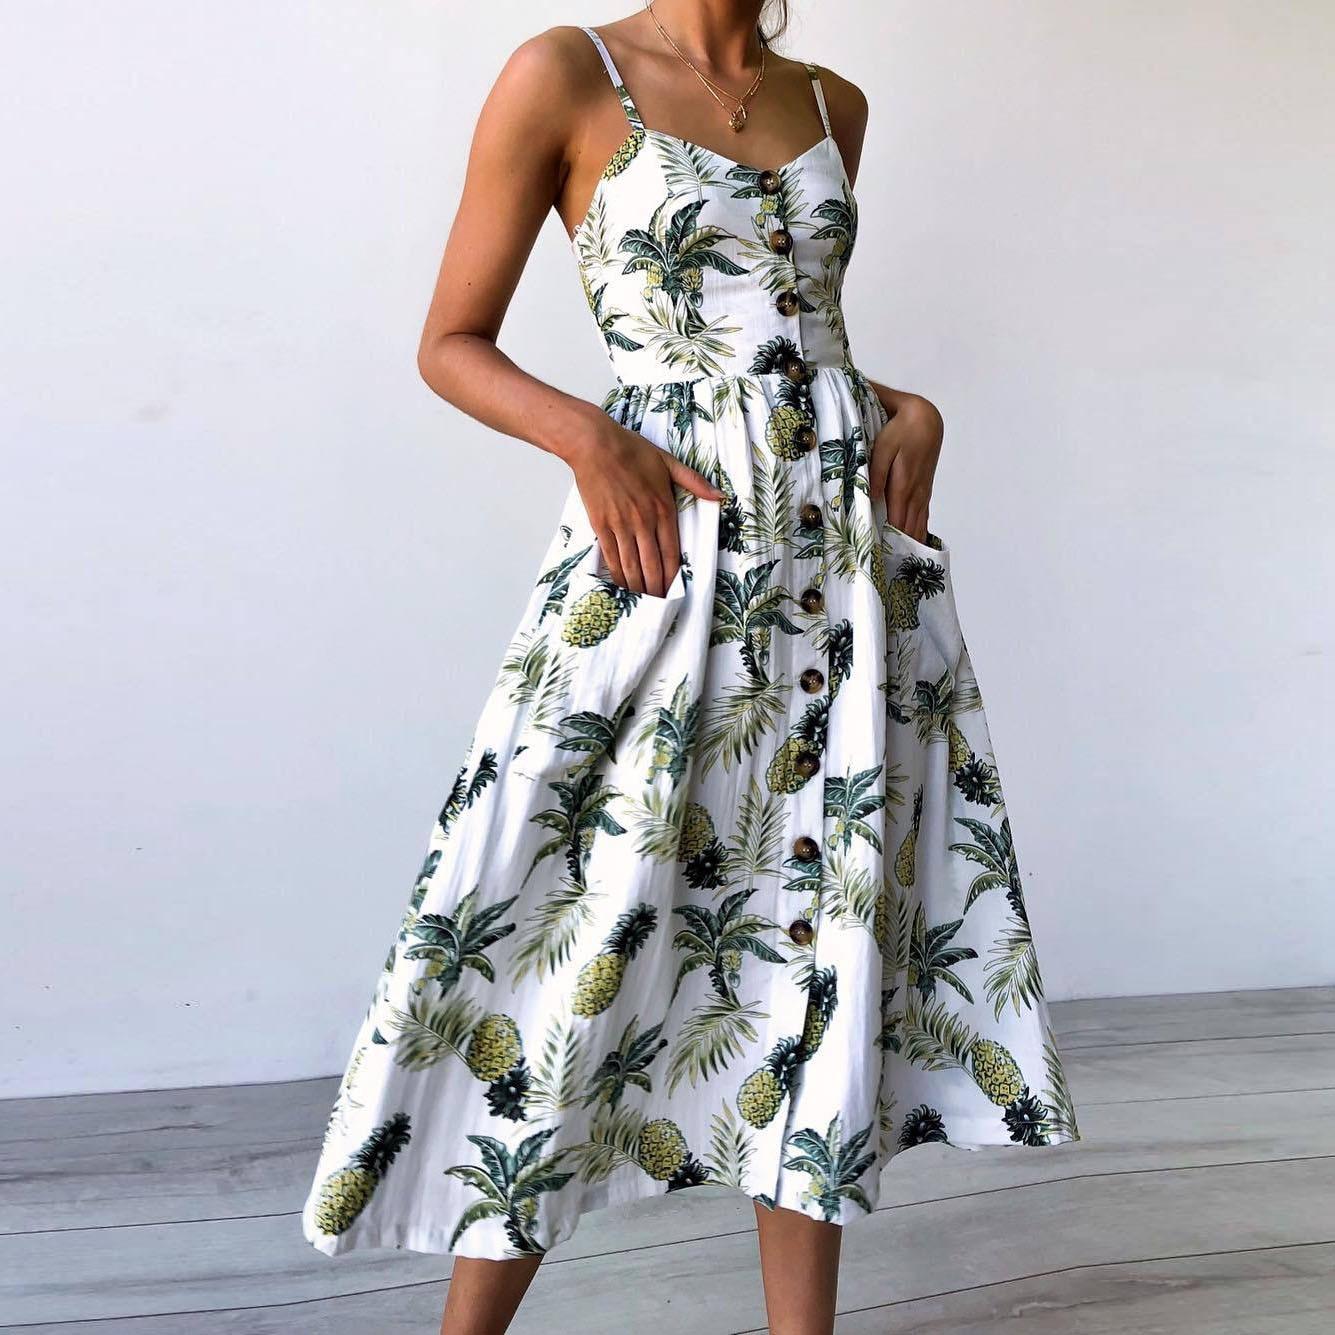 6b1b0188f61 Boho Floral Print Summer Dress Women V Neck Pockets Sleeveless Midi ...